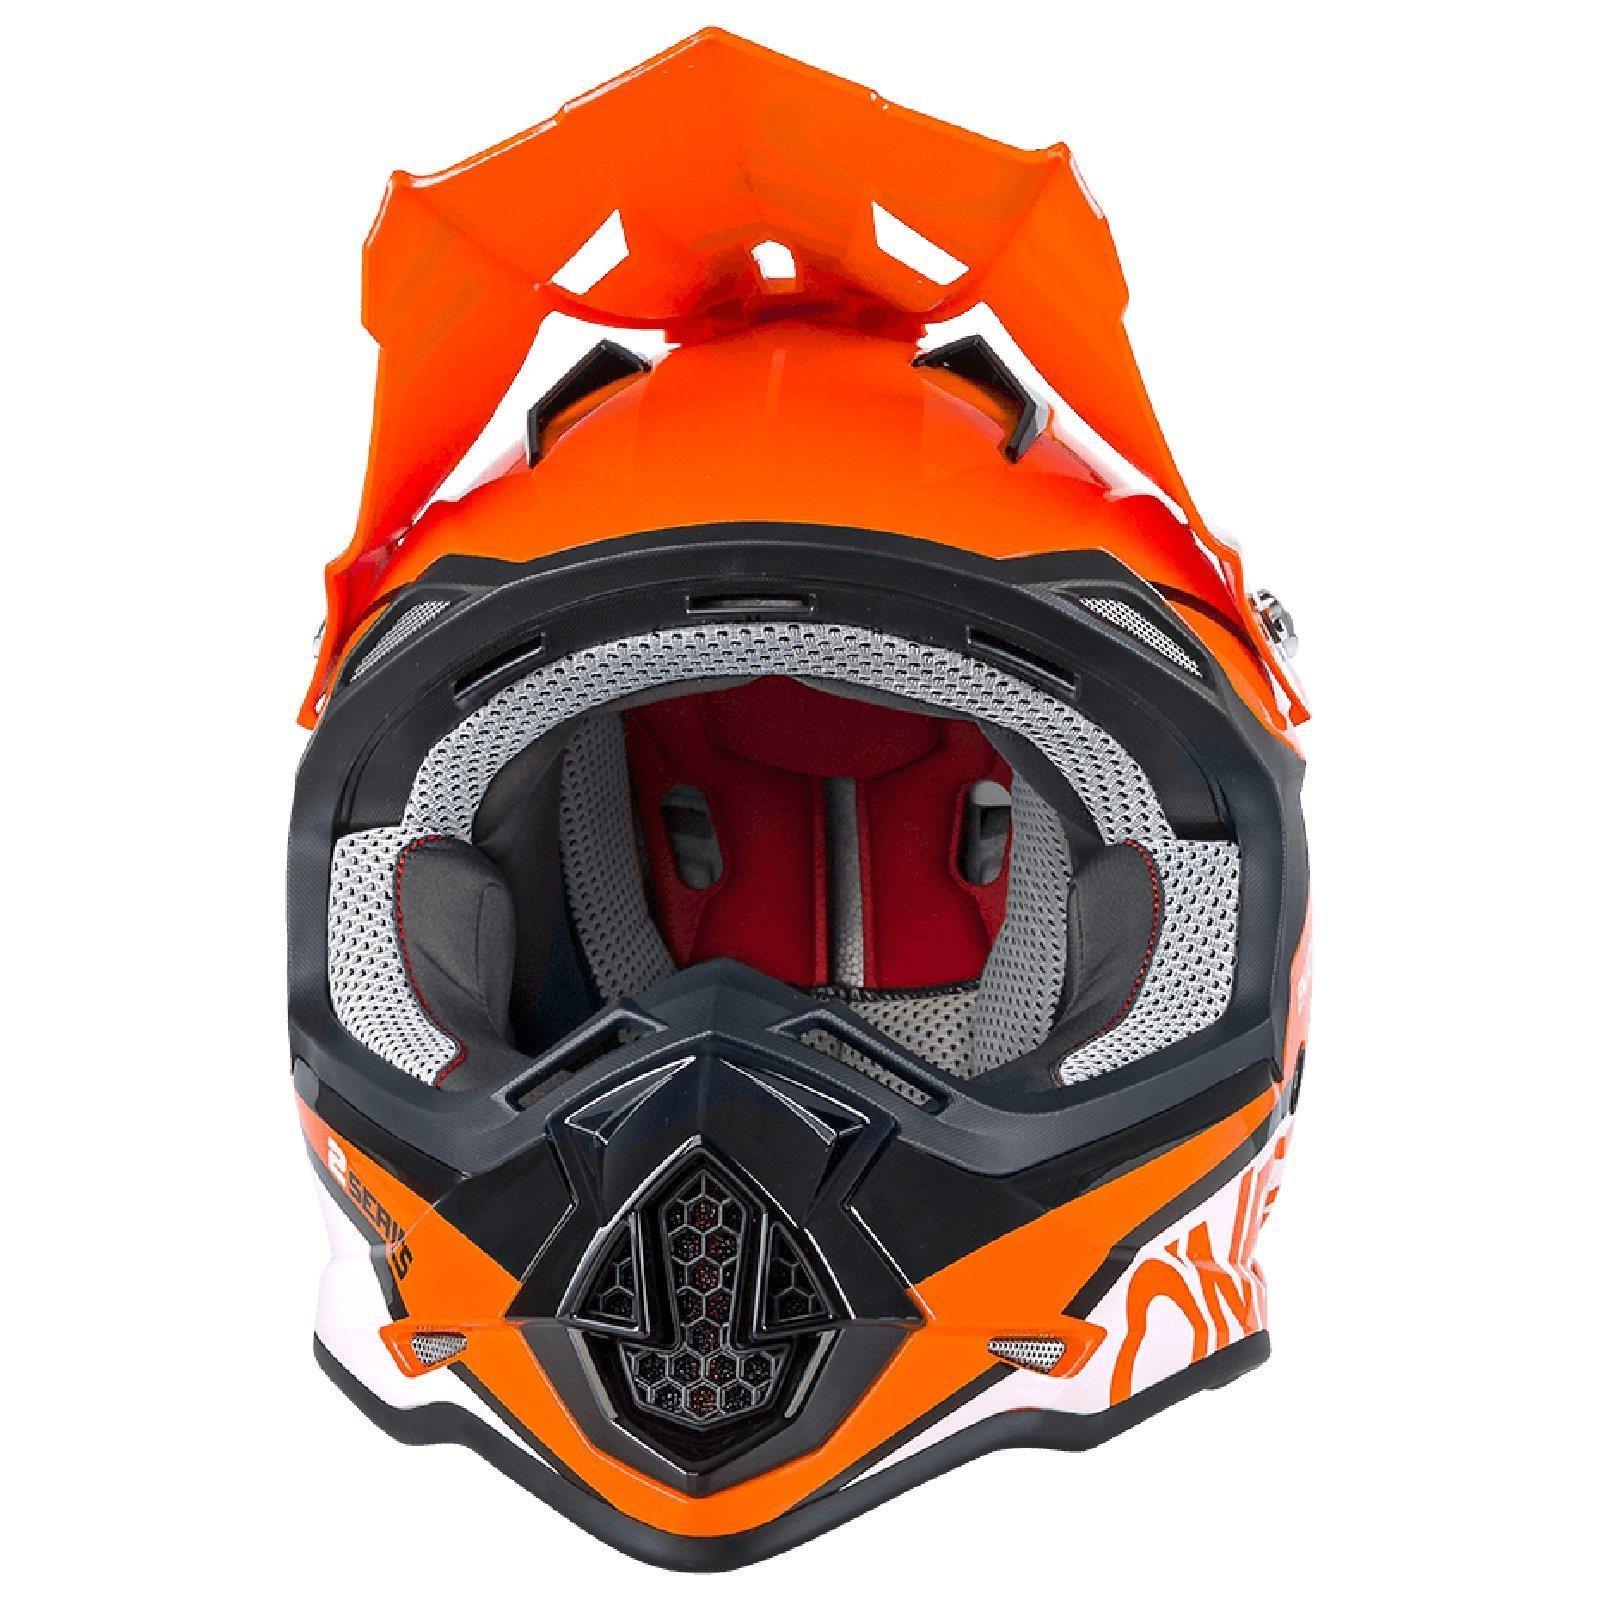 ONEAL-2-Series-RL-SPYDE-moto-cross-MX-Casco-Enduro-Trail-QUAD-OFFROAD-MOTO miniatura 17